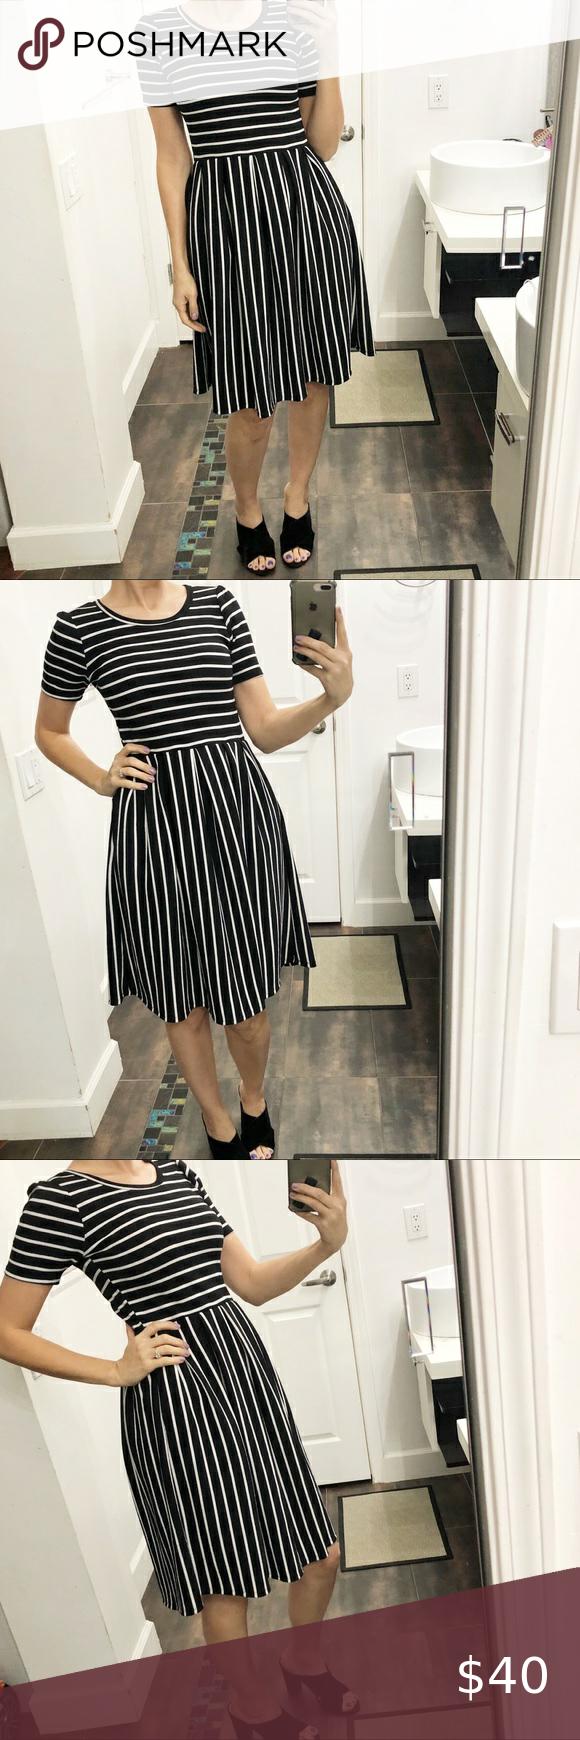 Nwot Lularoe Beautiful Black White Dress Small New Without Tags Black And White Stripes Stretchy Dress I M Si Black White Dress White Dress Stretchy Dress [ 1740 x 580 Pixel ]